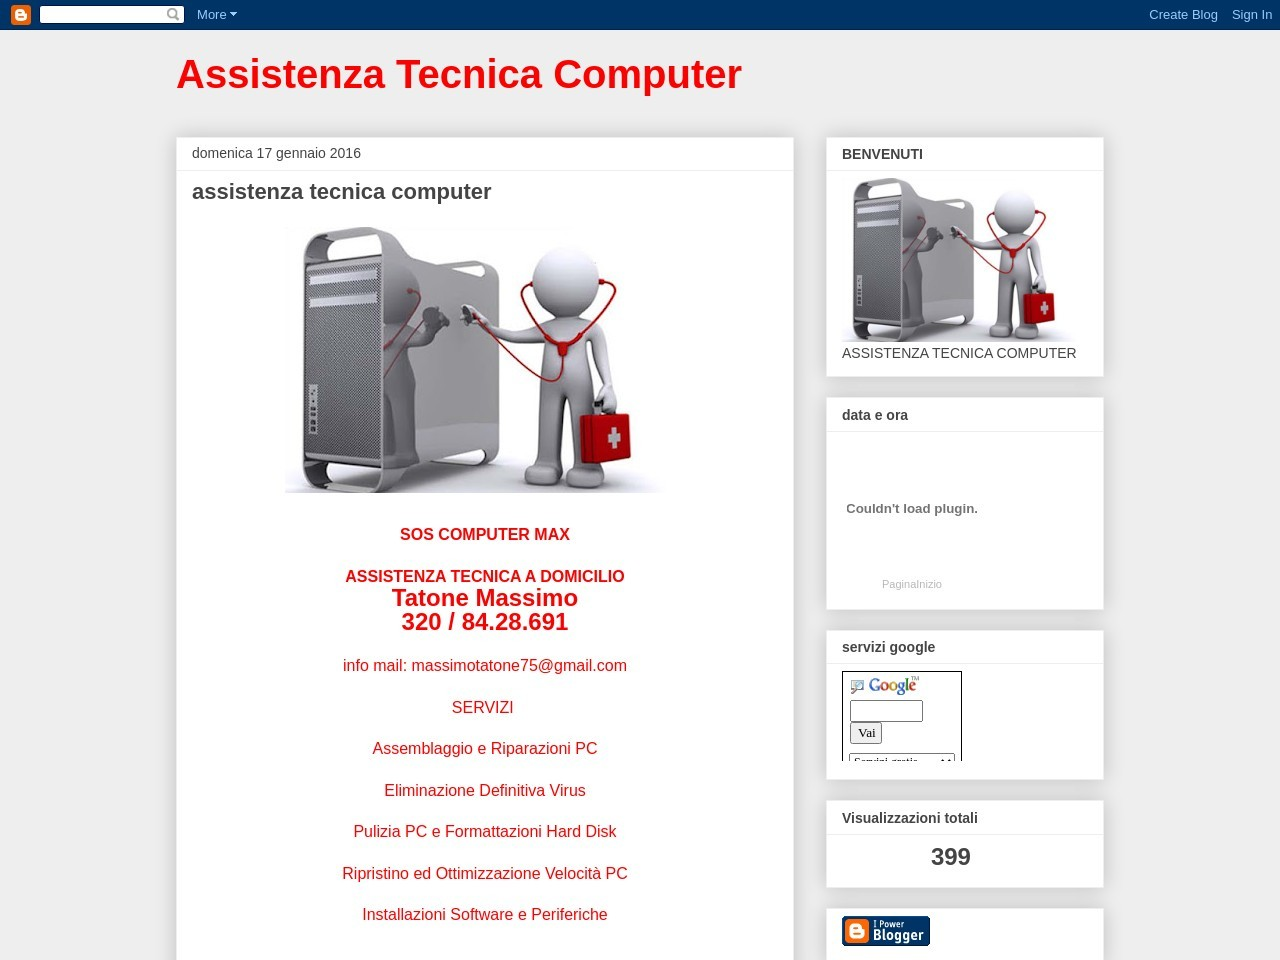 assistenza-tecnica-computer